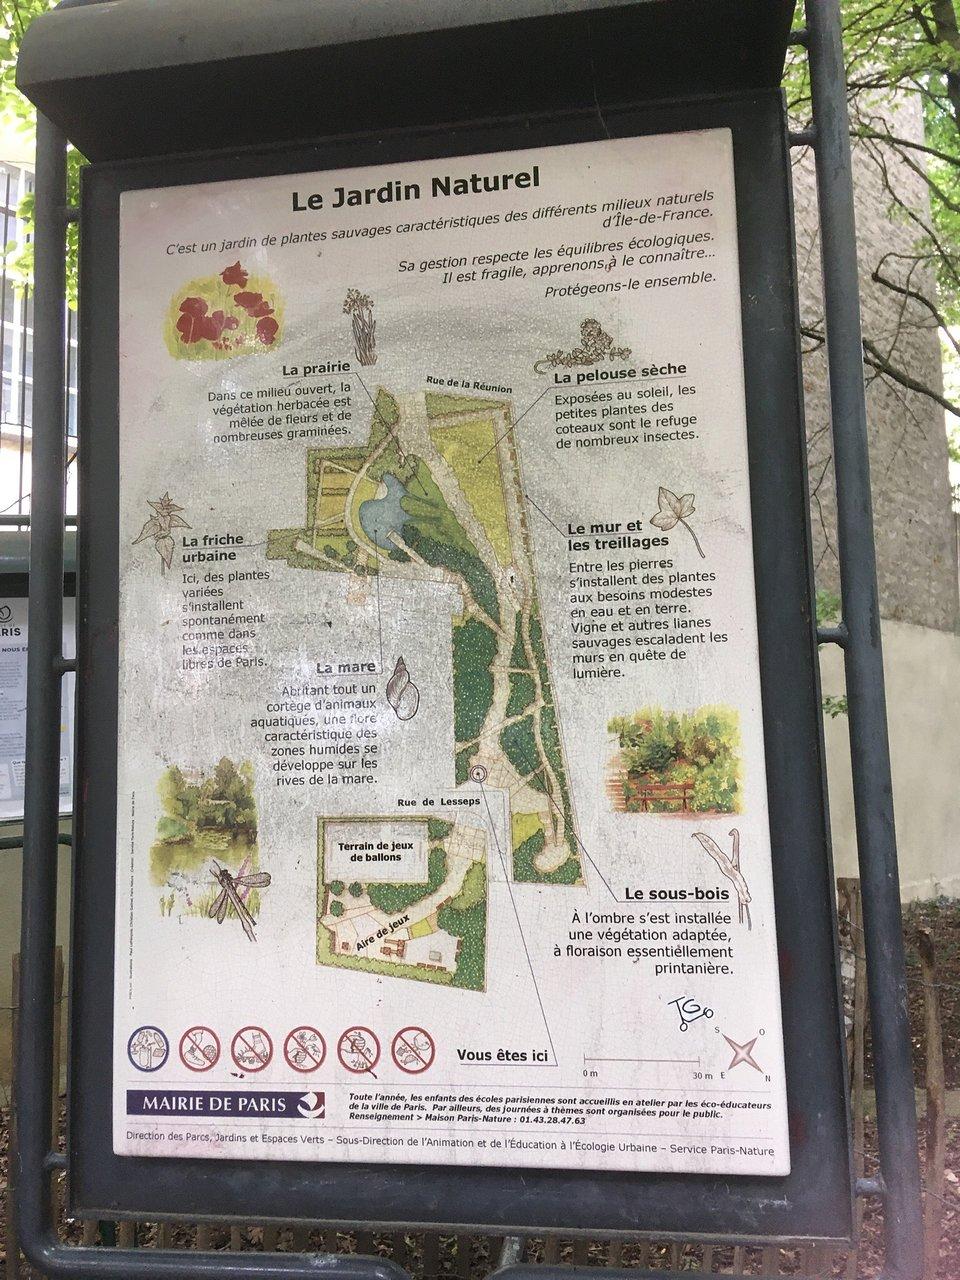 jardin naturel pierre emmanuel paris